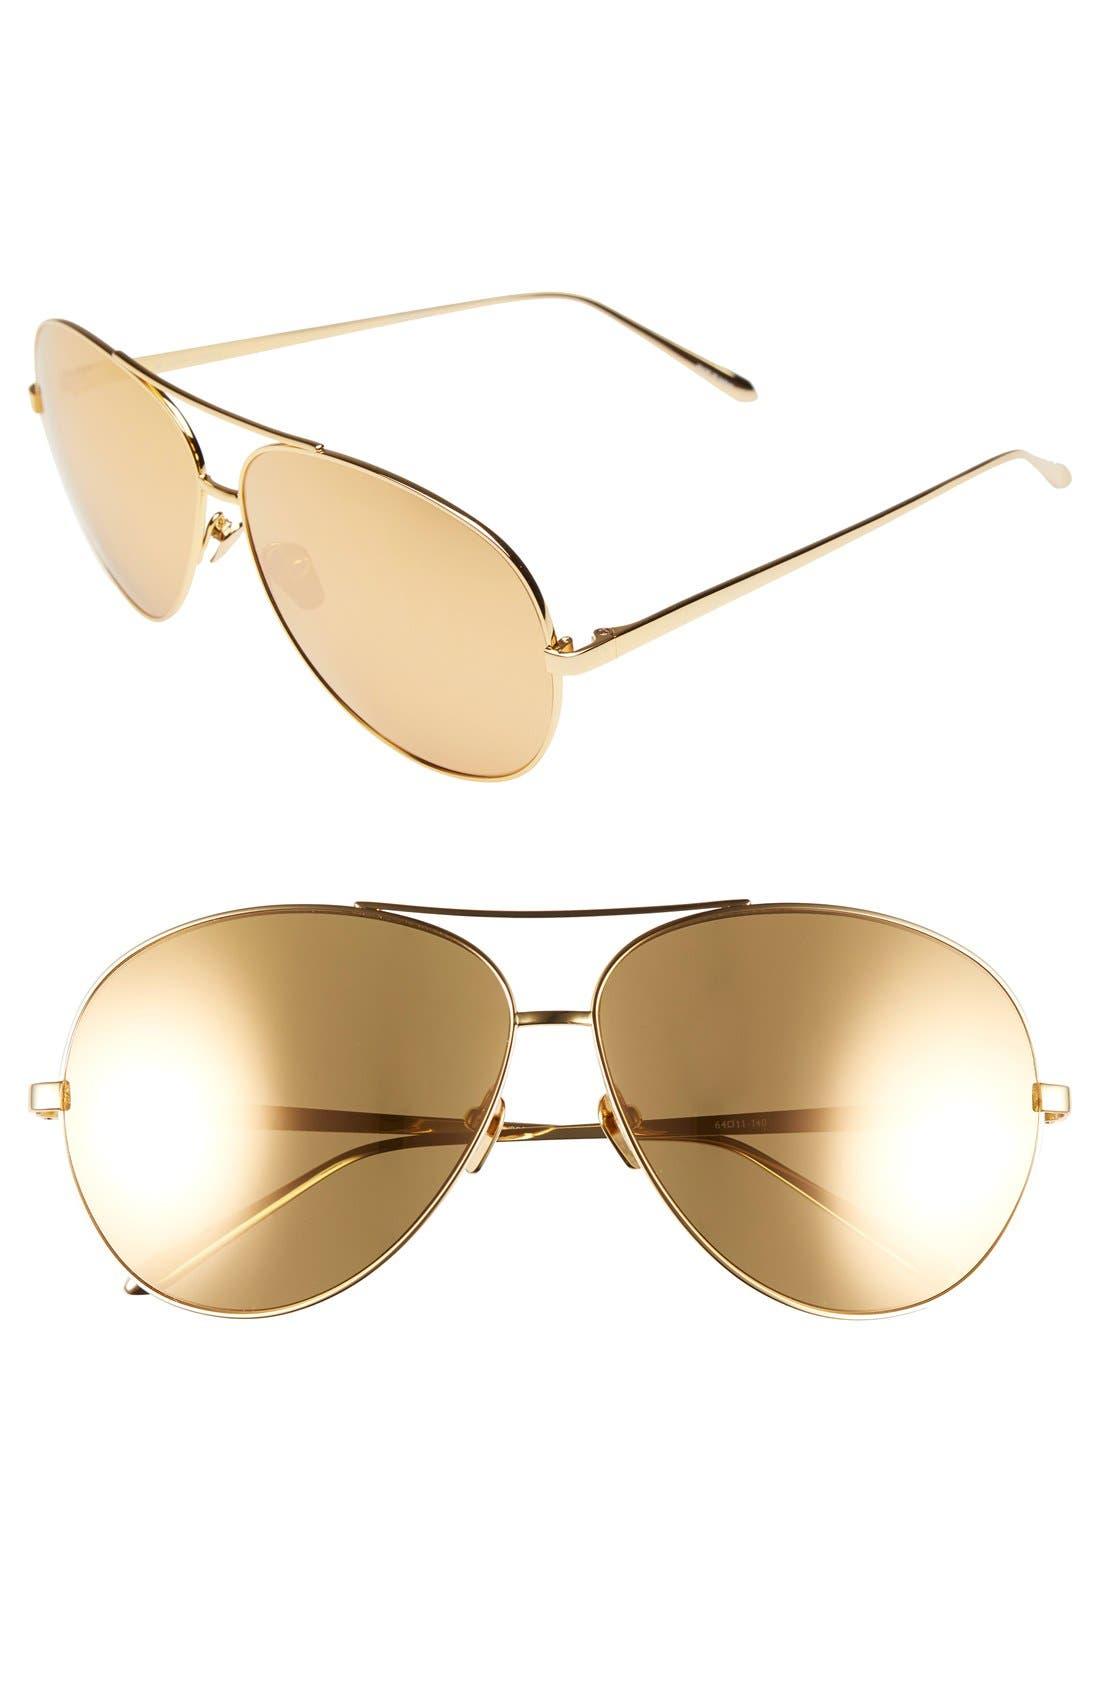 Linda Farrow 64mm 22 Karat Gold Plated Aviator Sunglasses